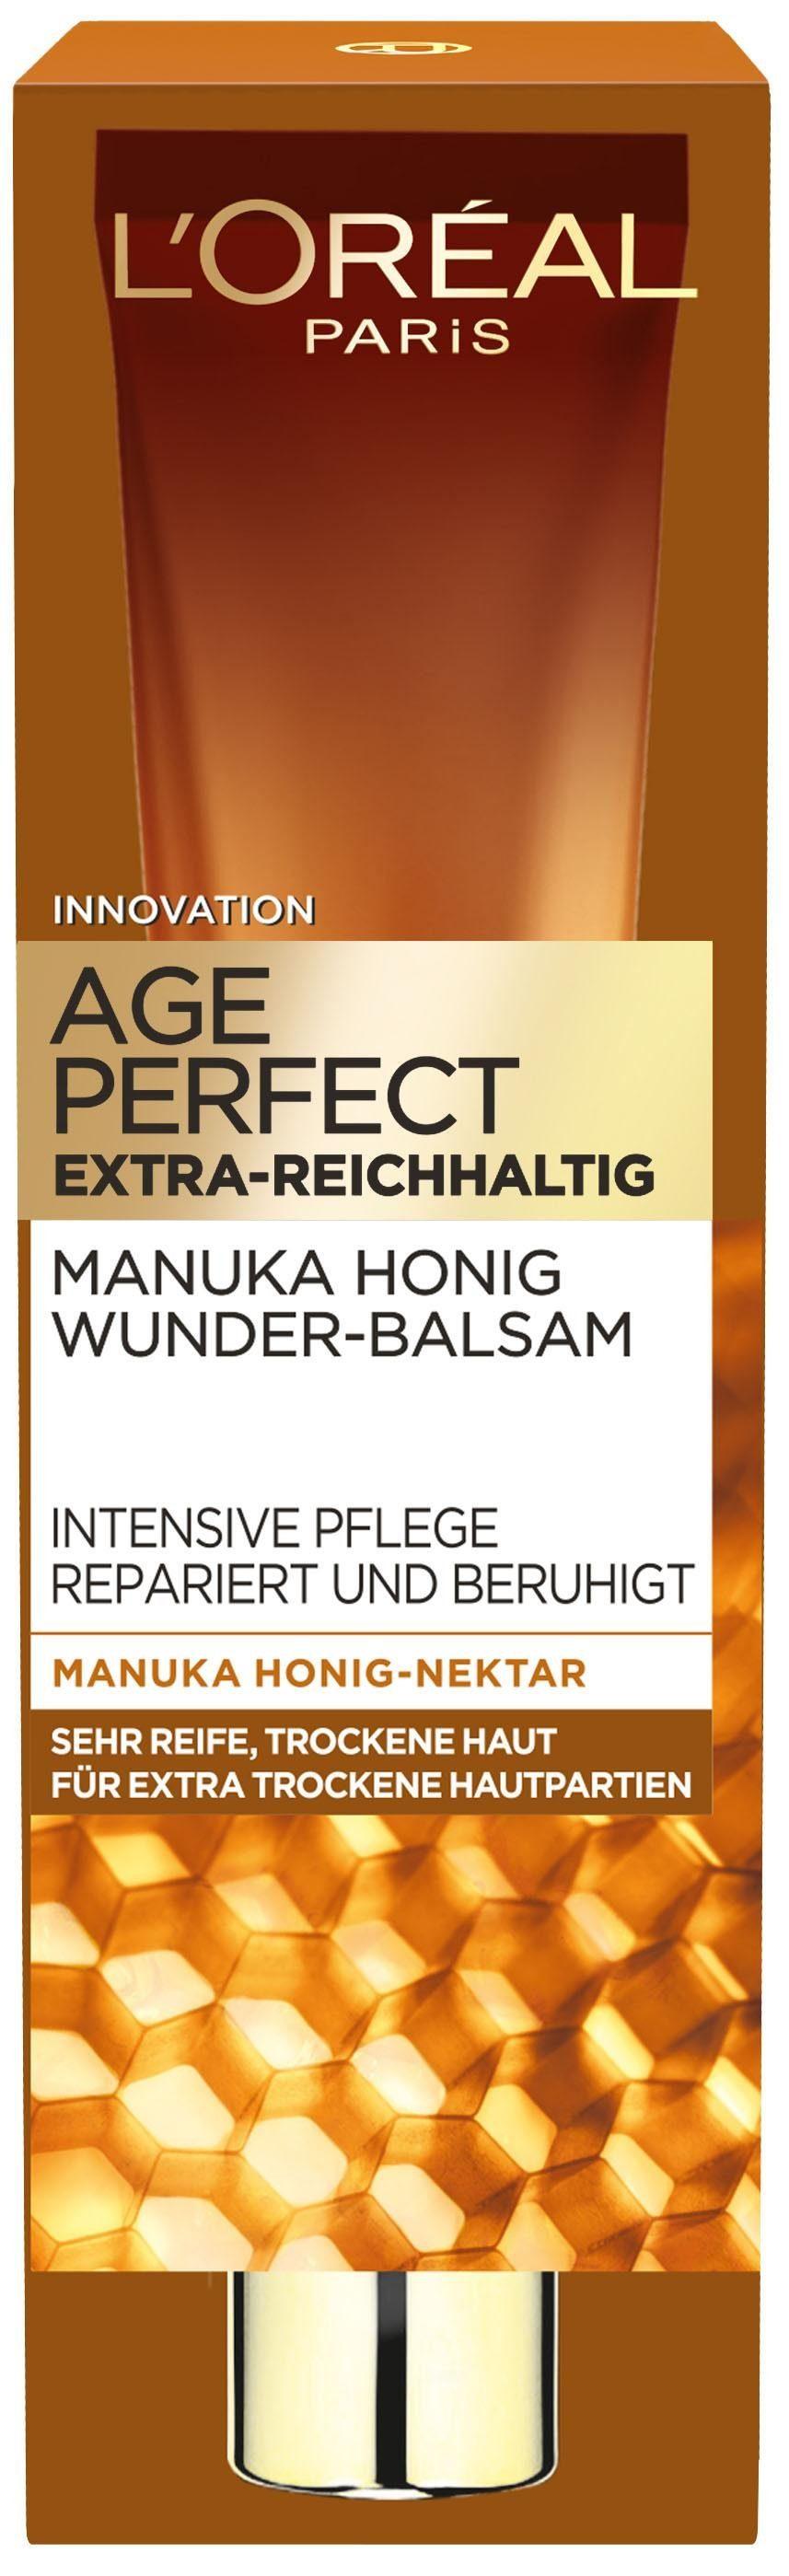 L'Oréal Paris, »Age Perfect Extra-Reichhaltig Manuka Wunder-Balsam«, Gesichtspflege